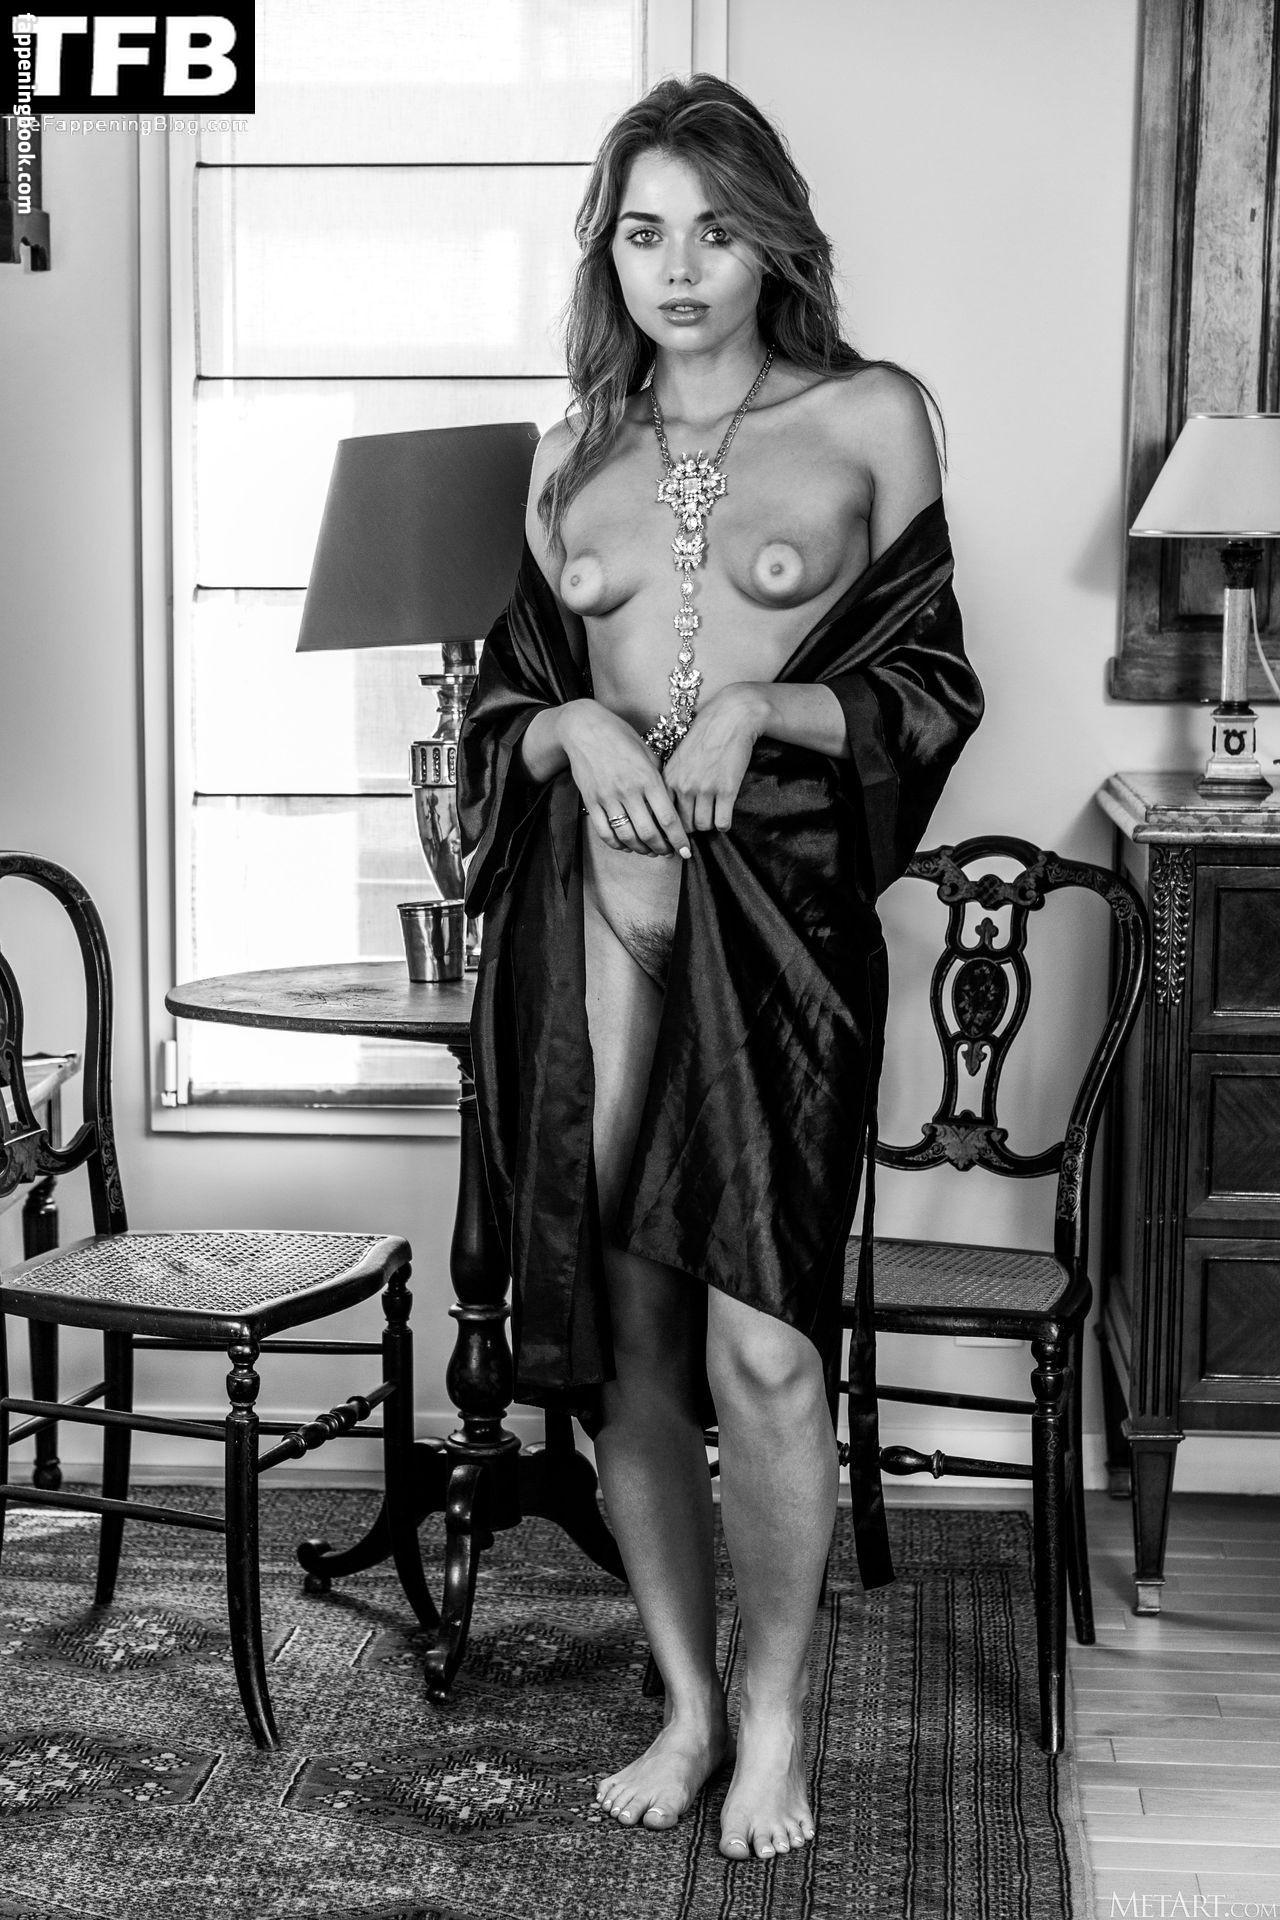 Keira Blue Nude